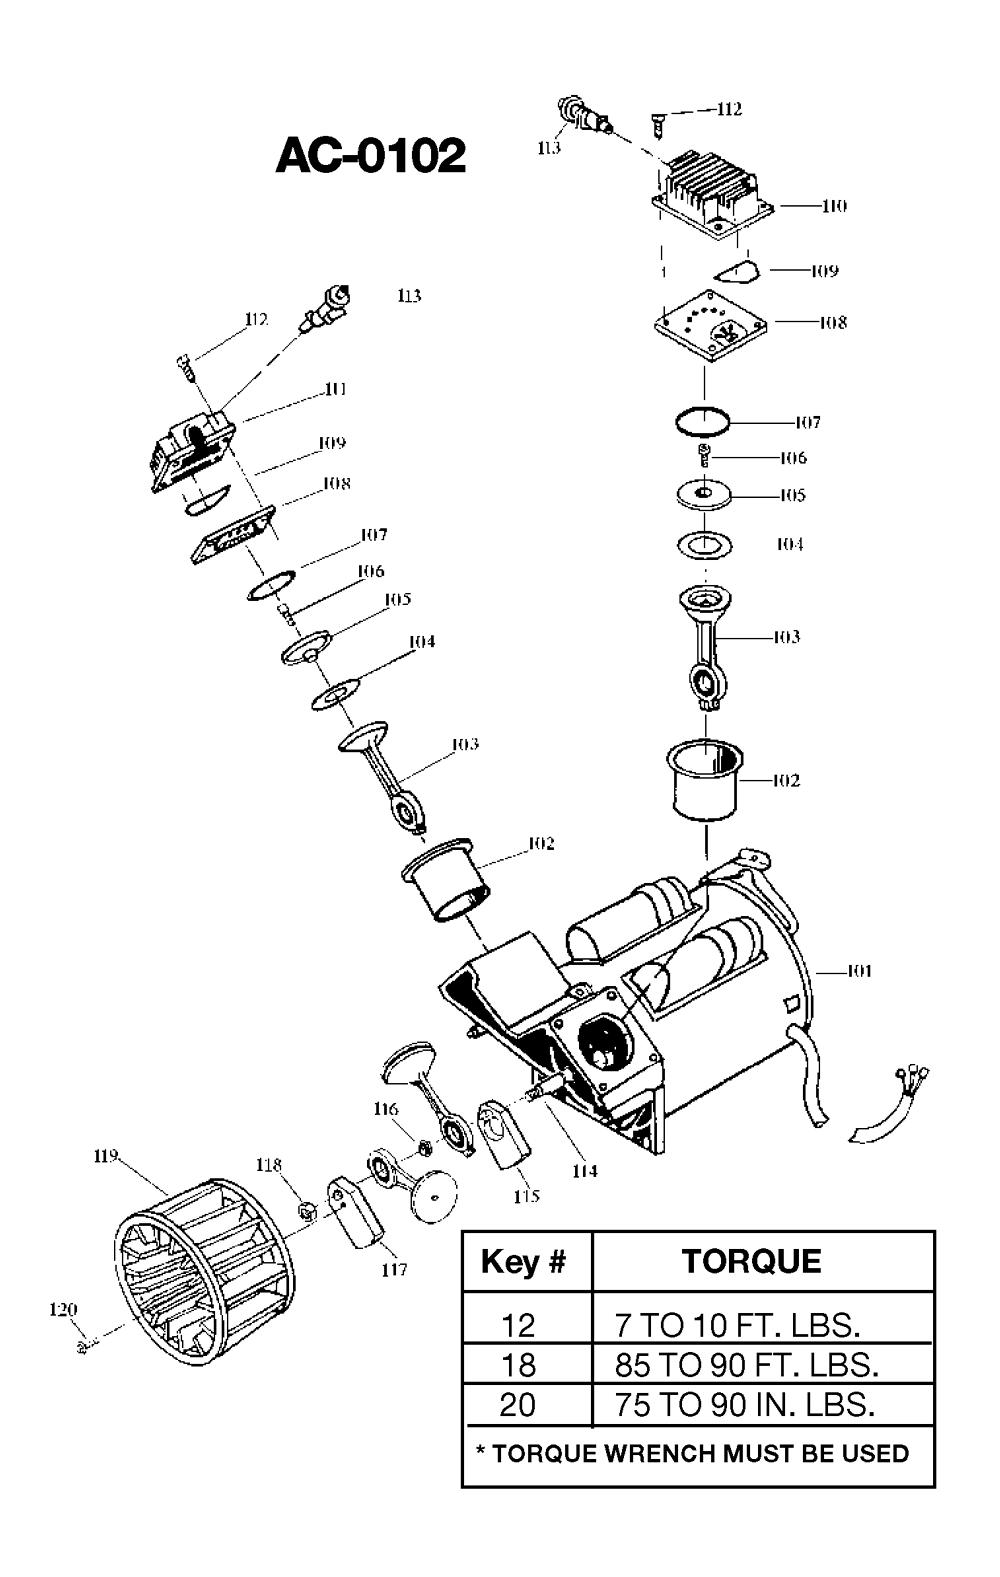 IR500TVE60V-Devilbiss-T2-PB-1Break Down